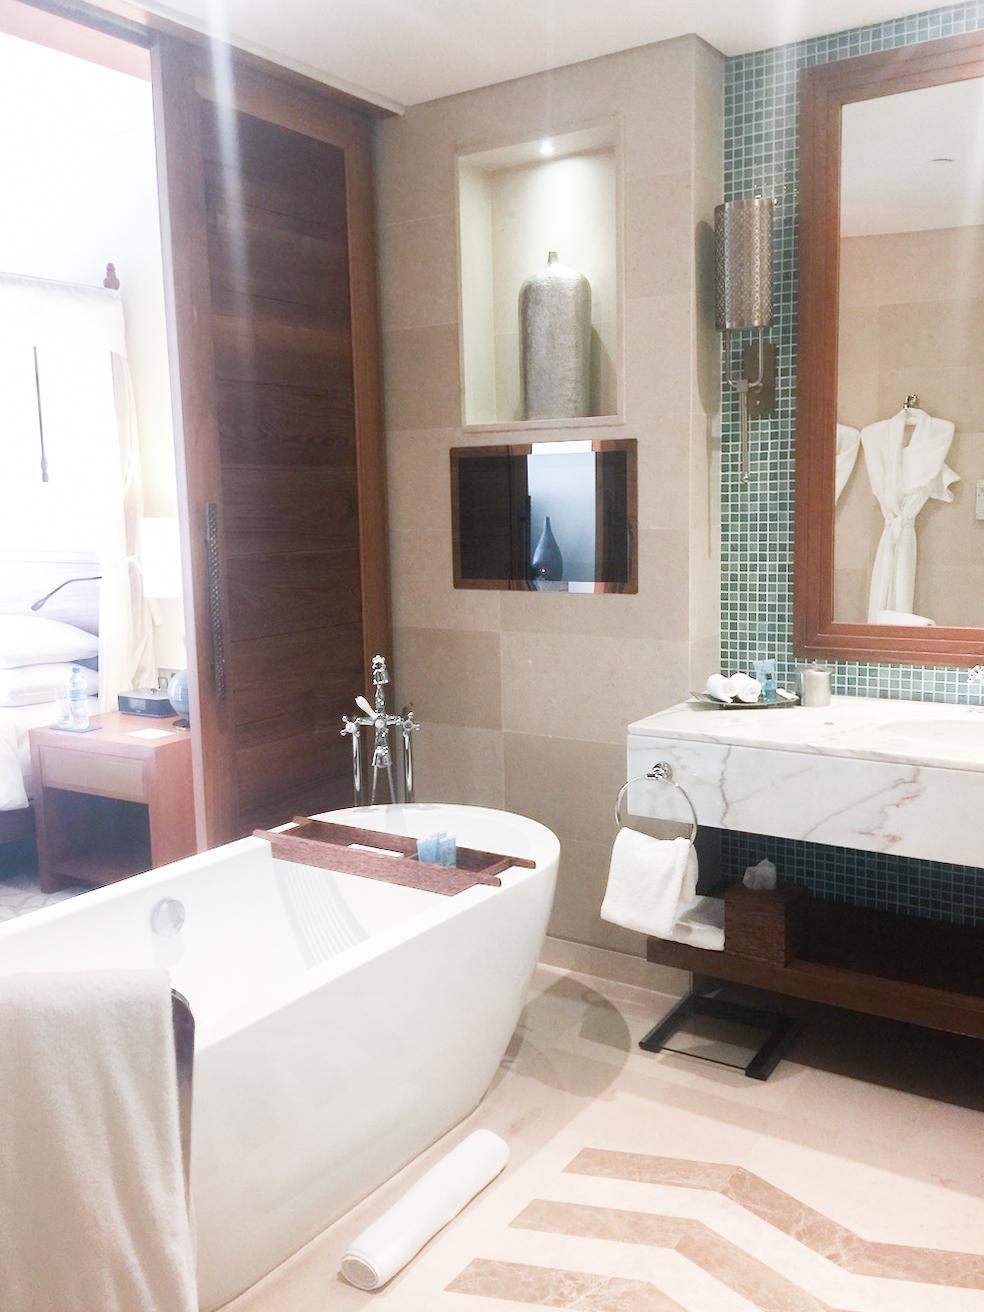 park-hyatt-hotel-zanzibar-stone-town-room-tour